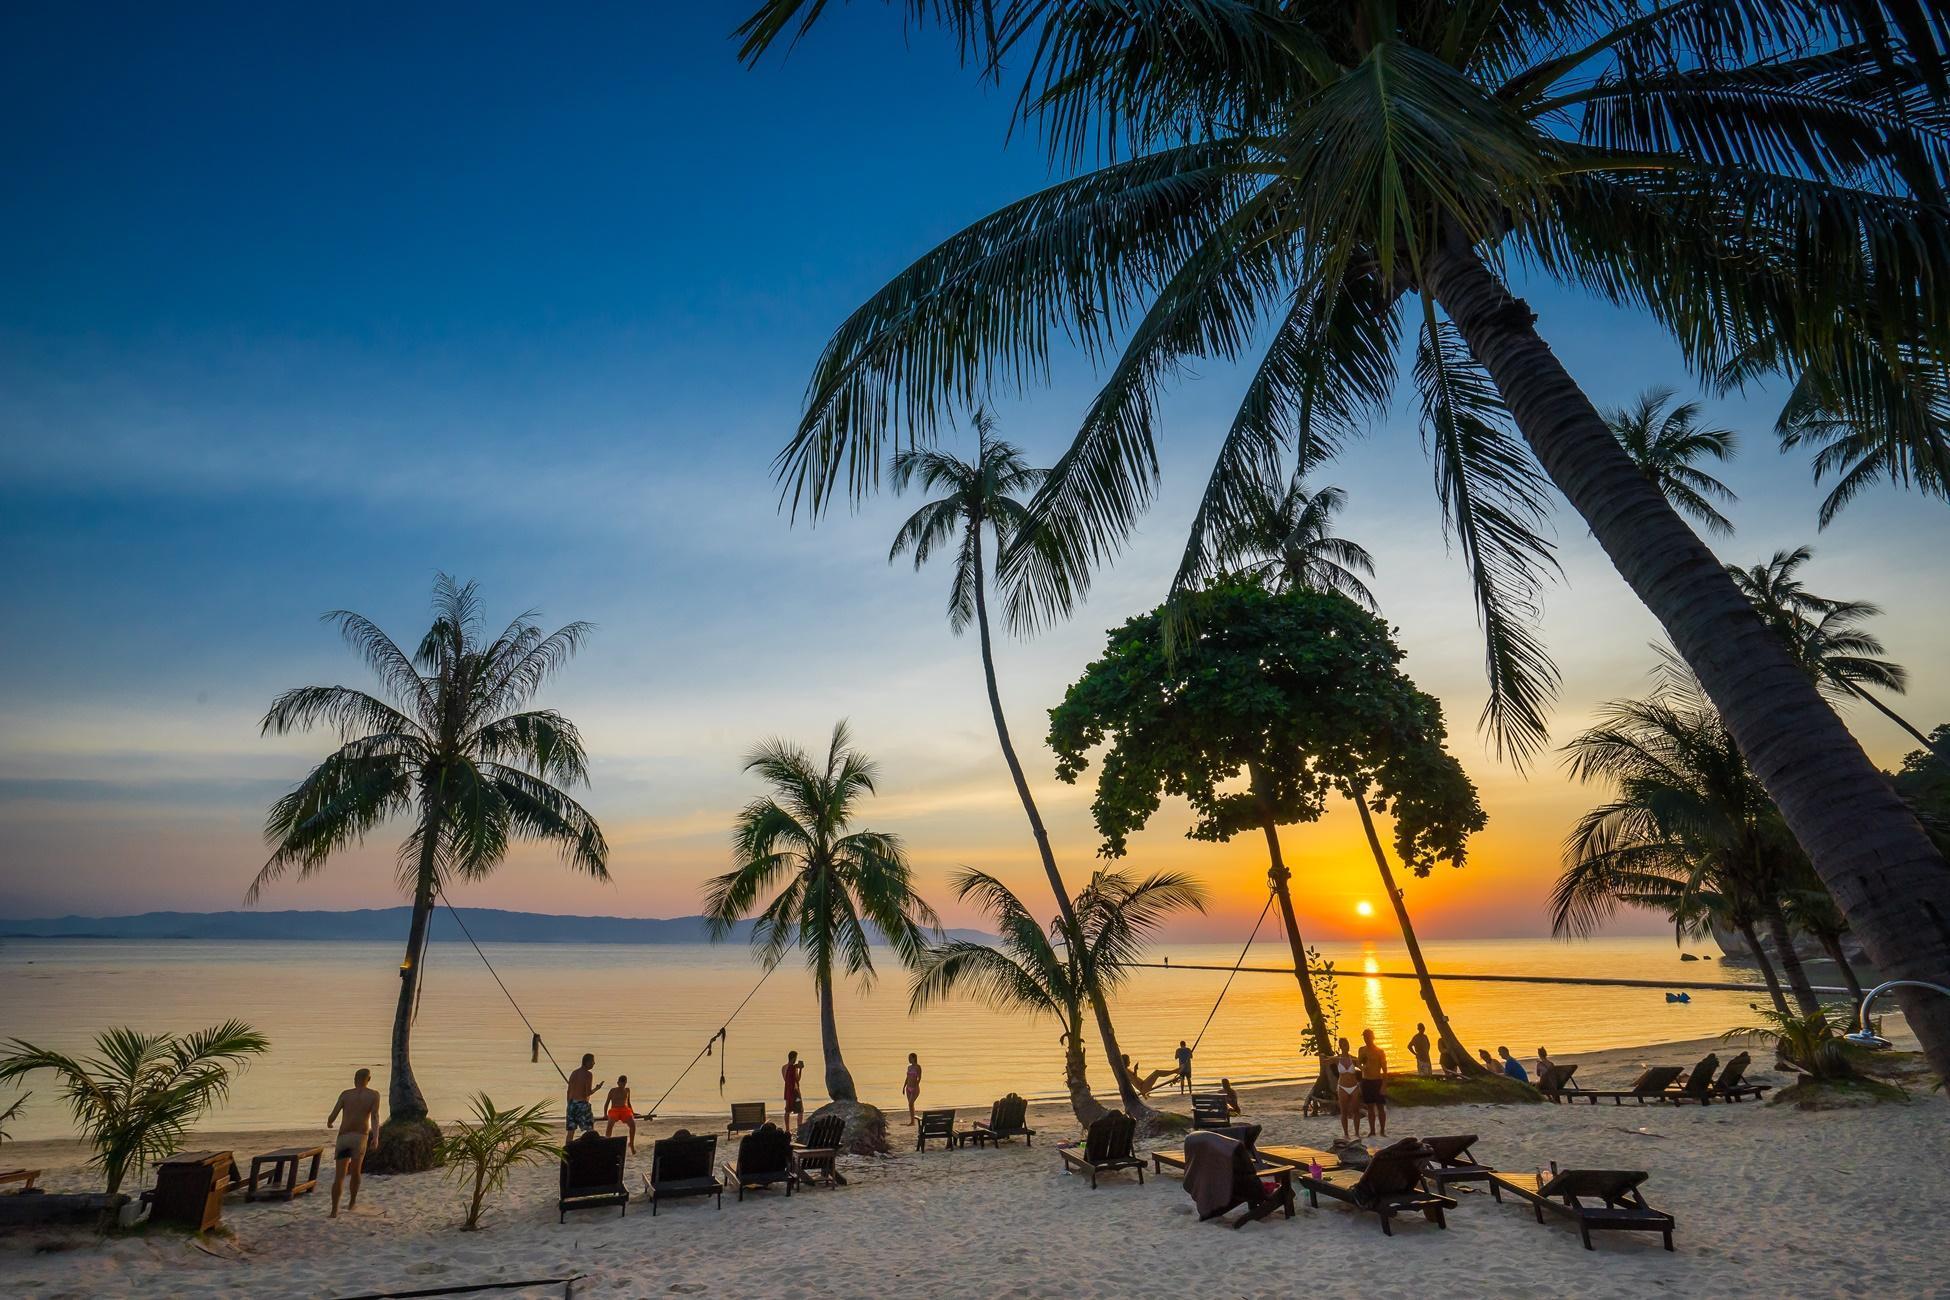 Cocohut Village Beach Resort And Spa